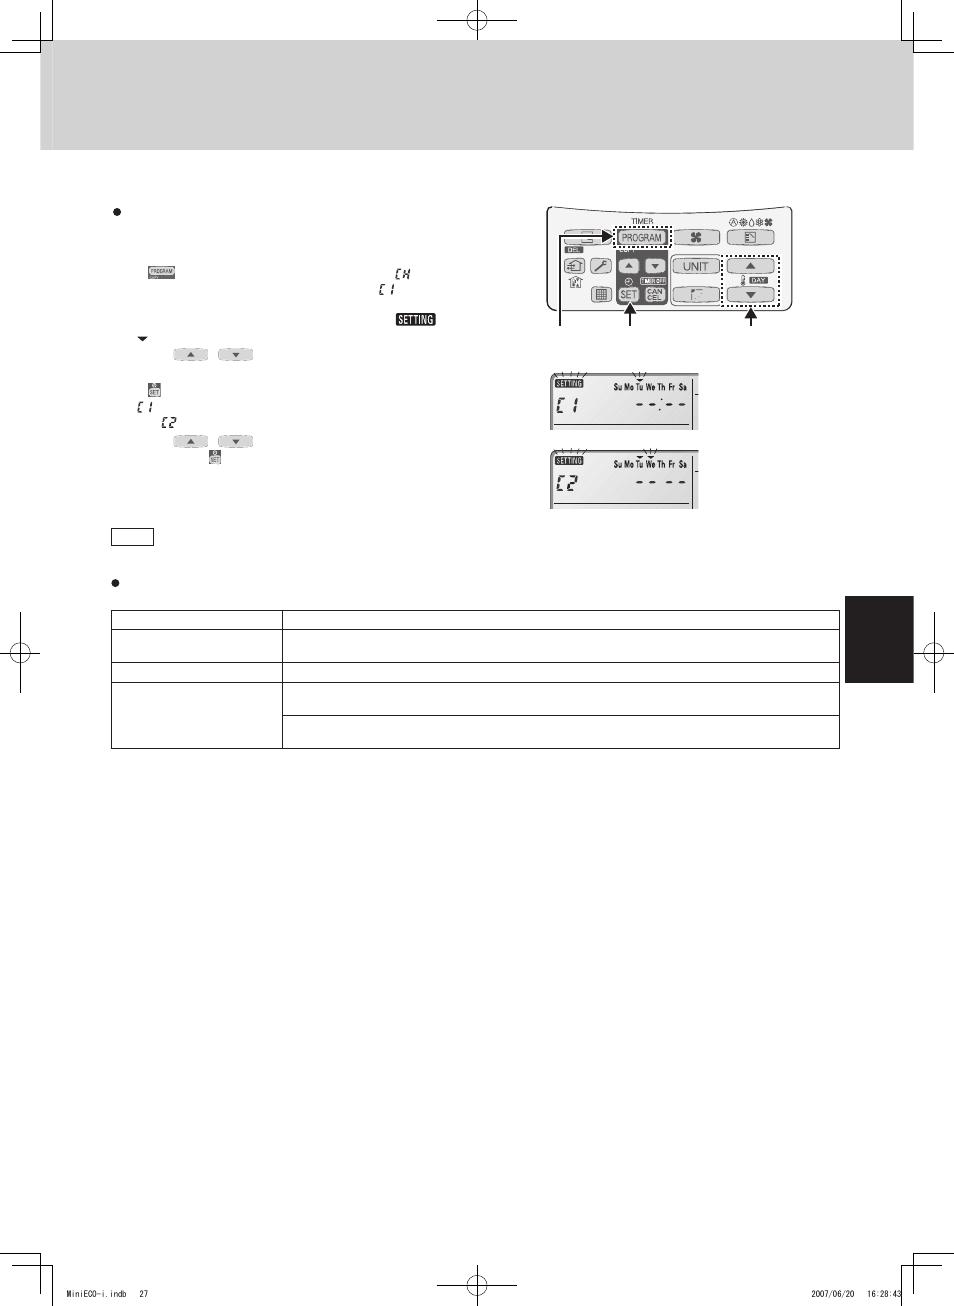 timer remote controller rcs tm80bg sanyo chx06052 user manual rh manualsdir com sanyo rcs-tm80bg user guide sanyo rcs tm80bg user manual